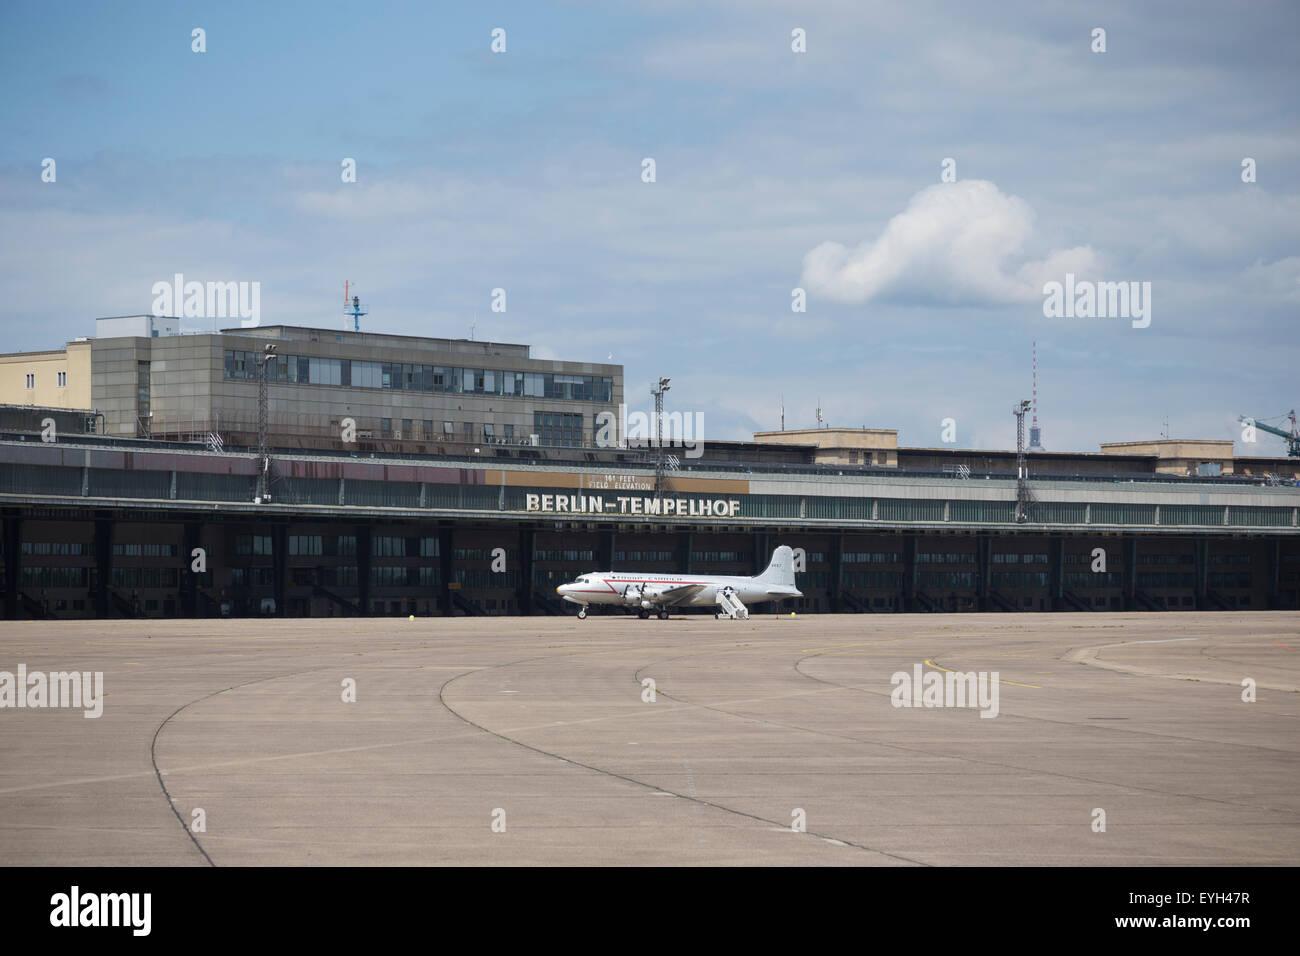 Airplane at Tempelhof airport, Berlin, Germany. - Stock Image